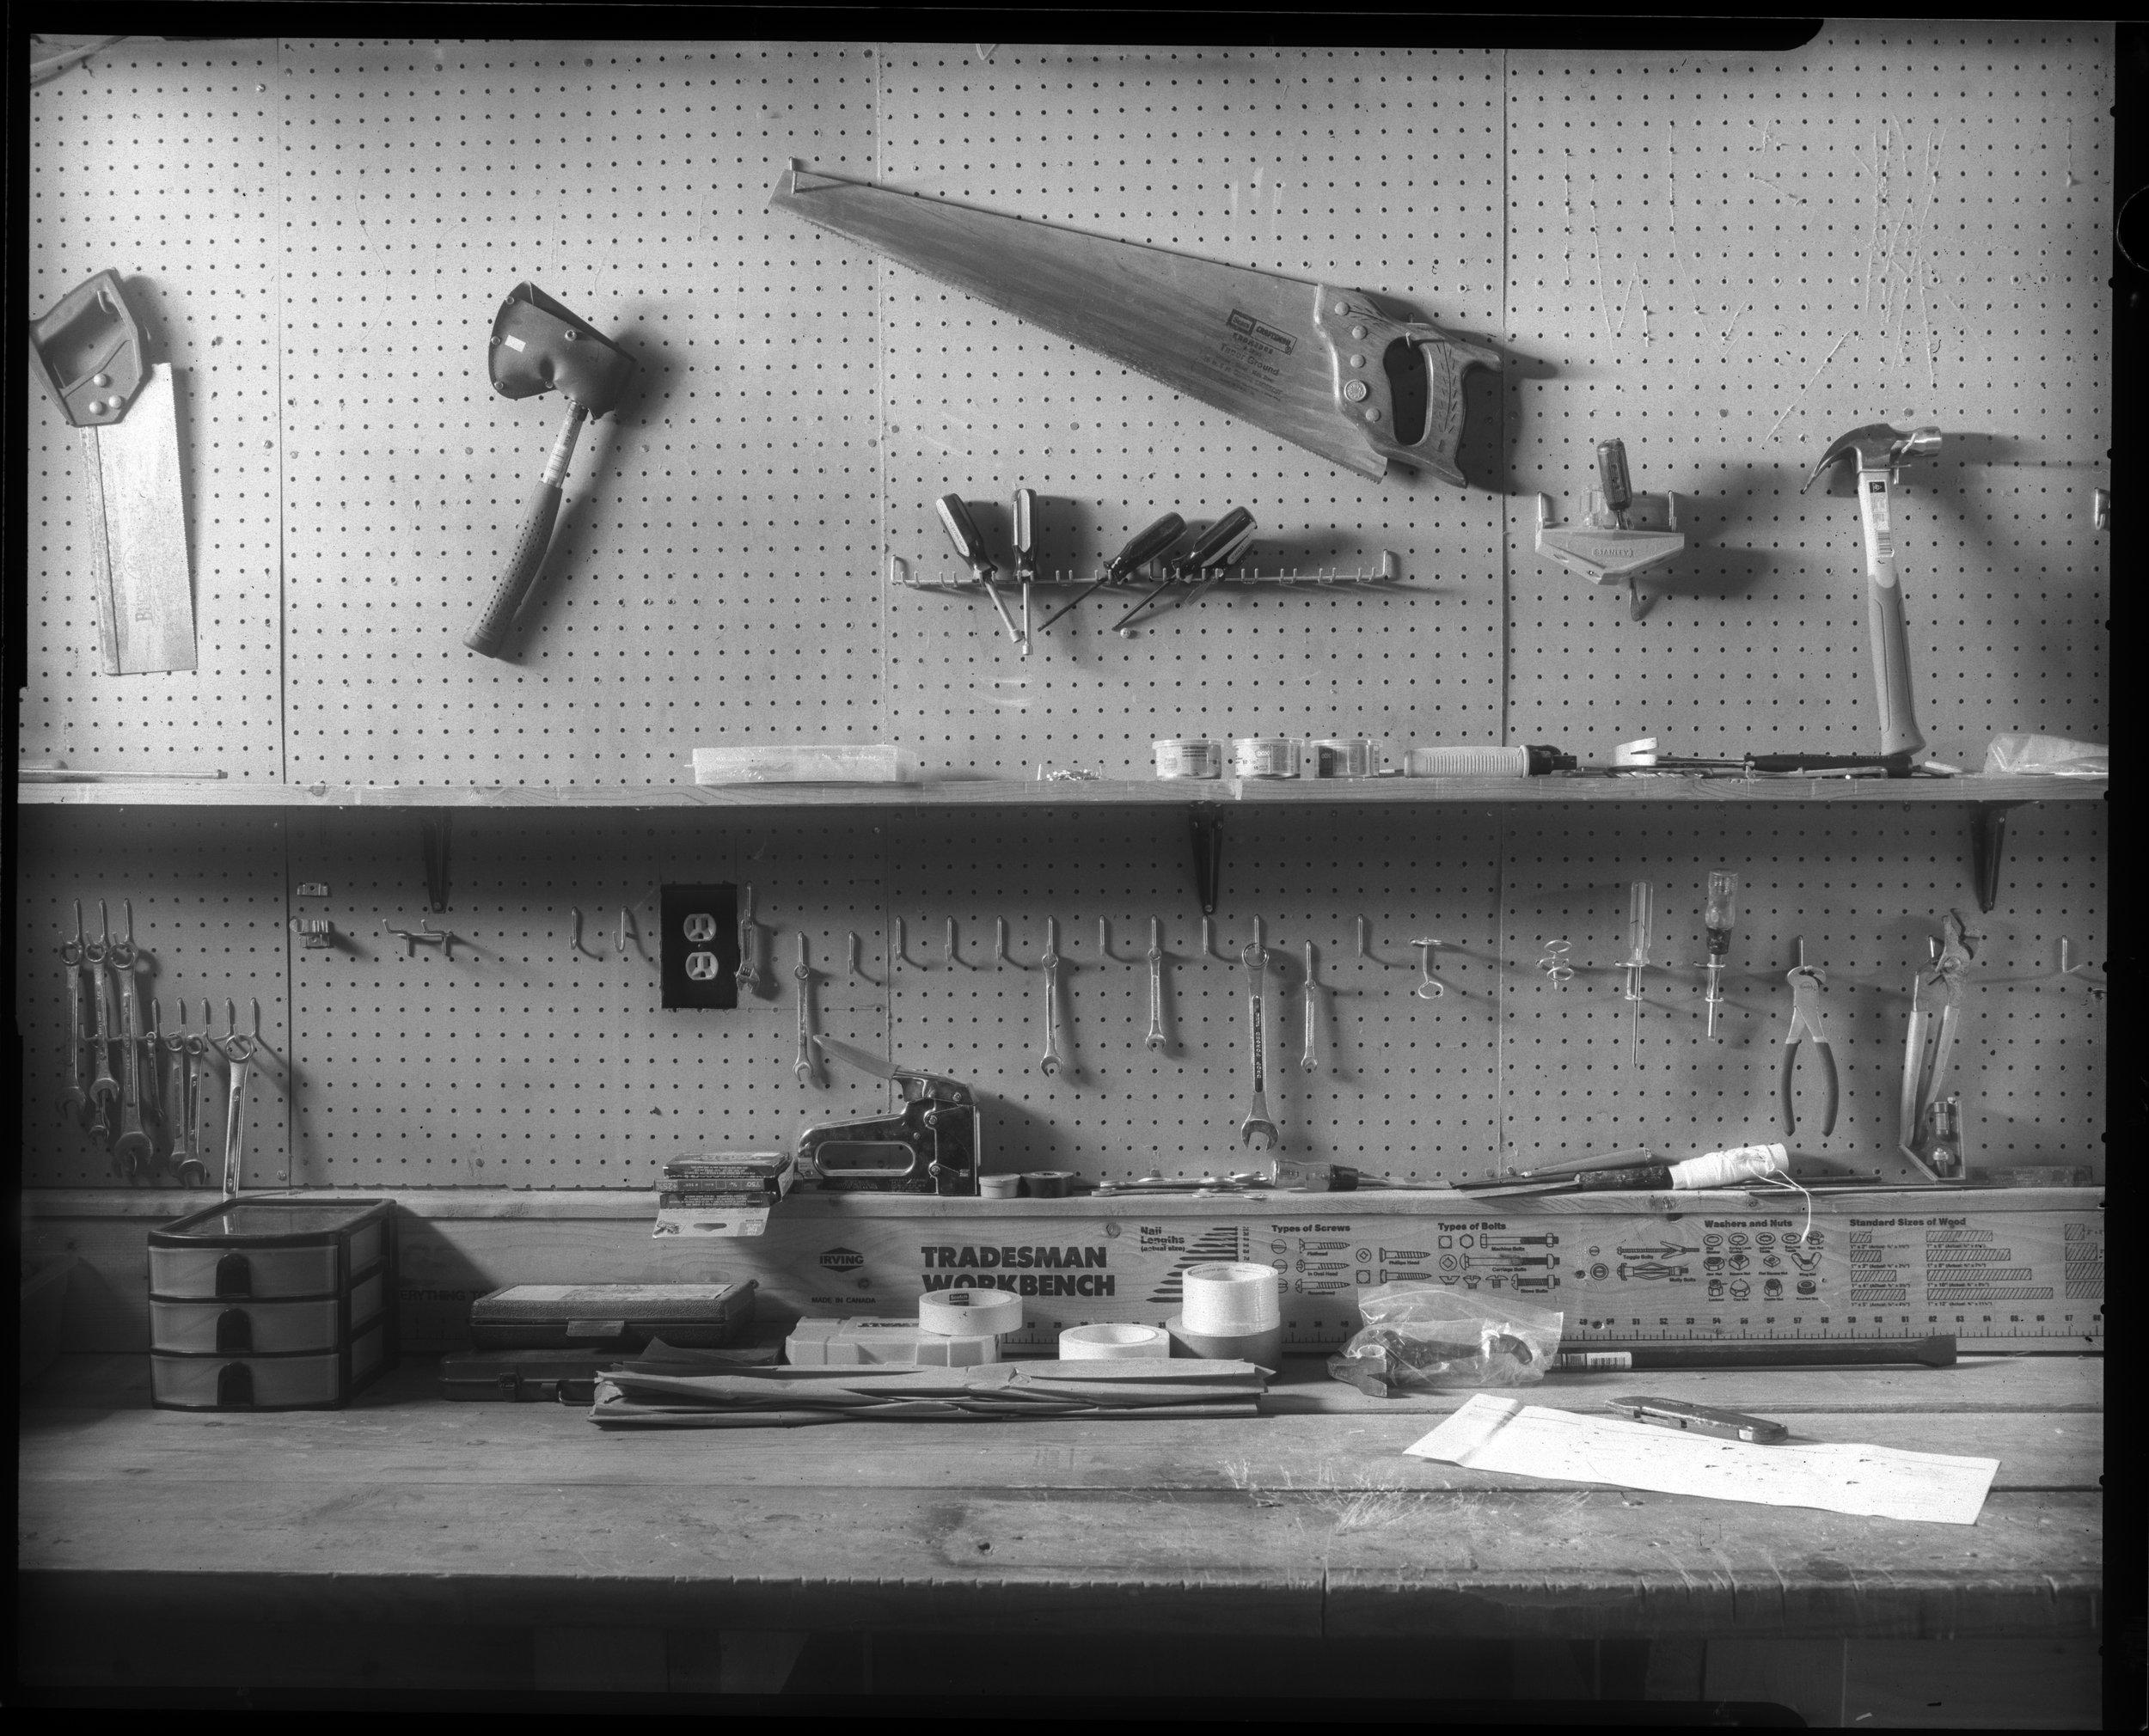 Papa's tool bench, Ithaca